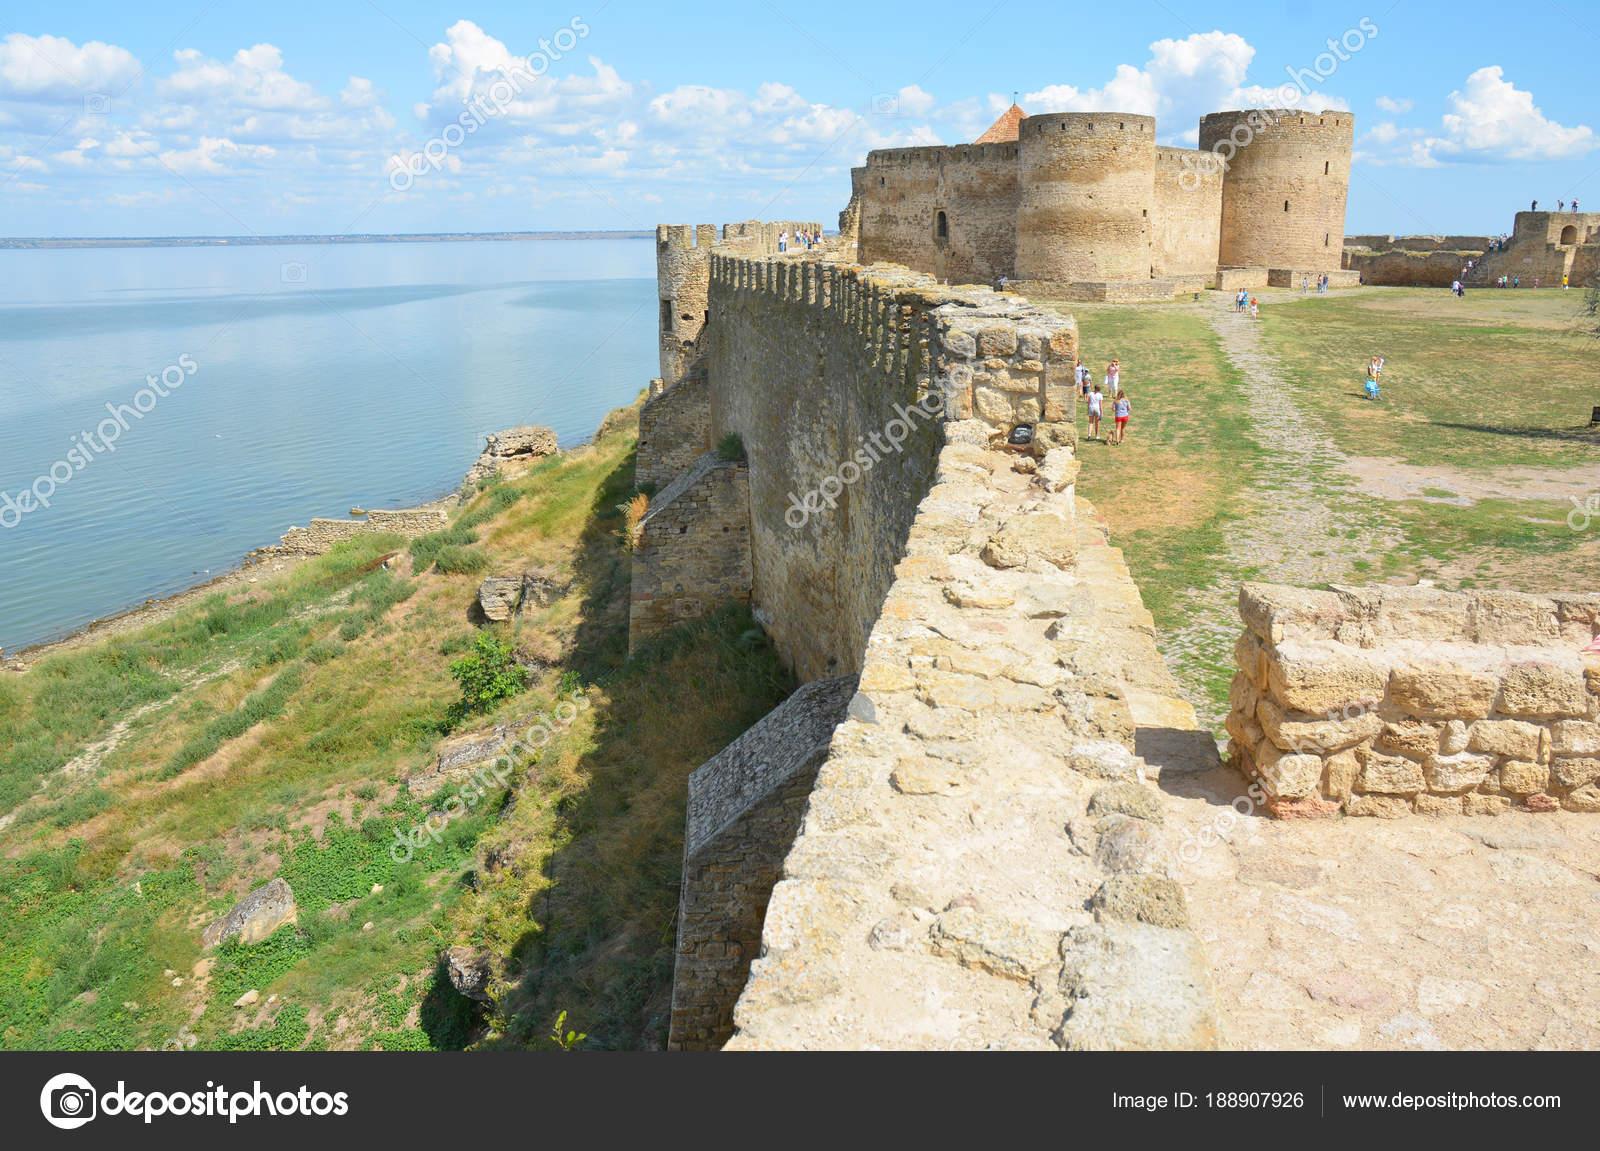 Akkerman Fortress: description, history 91